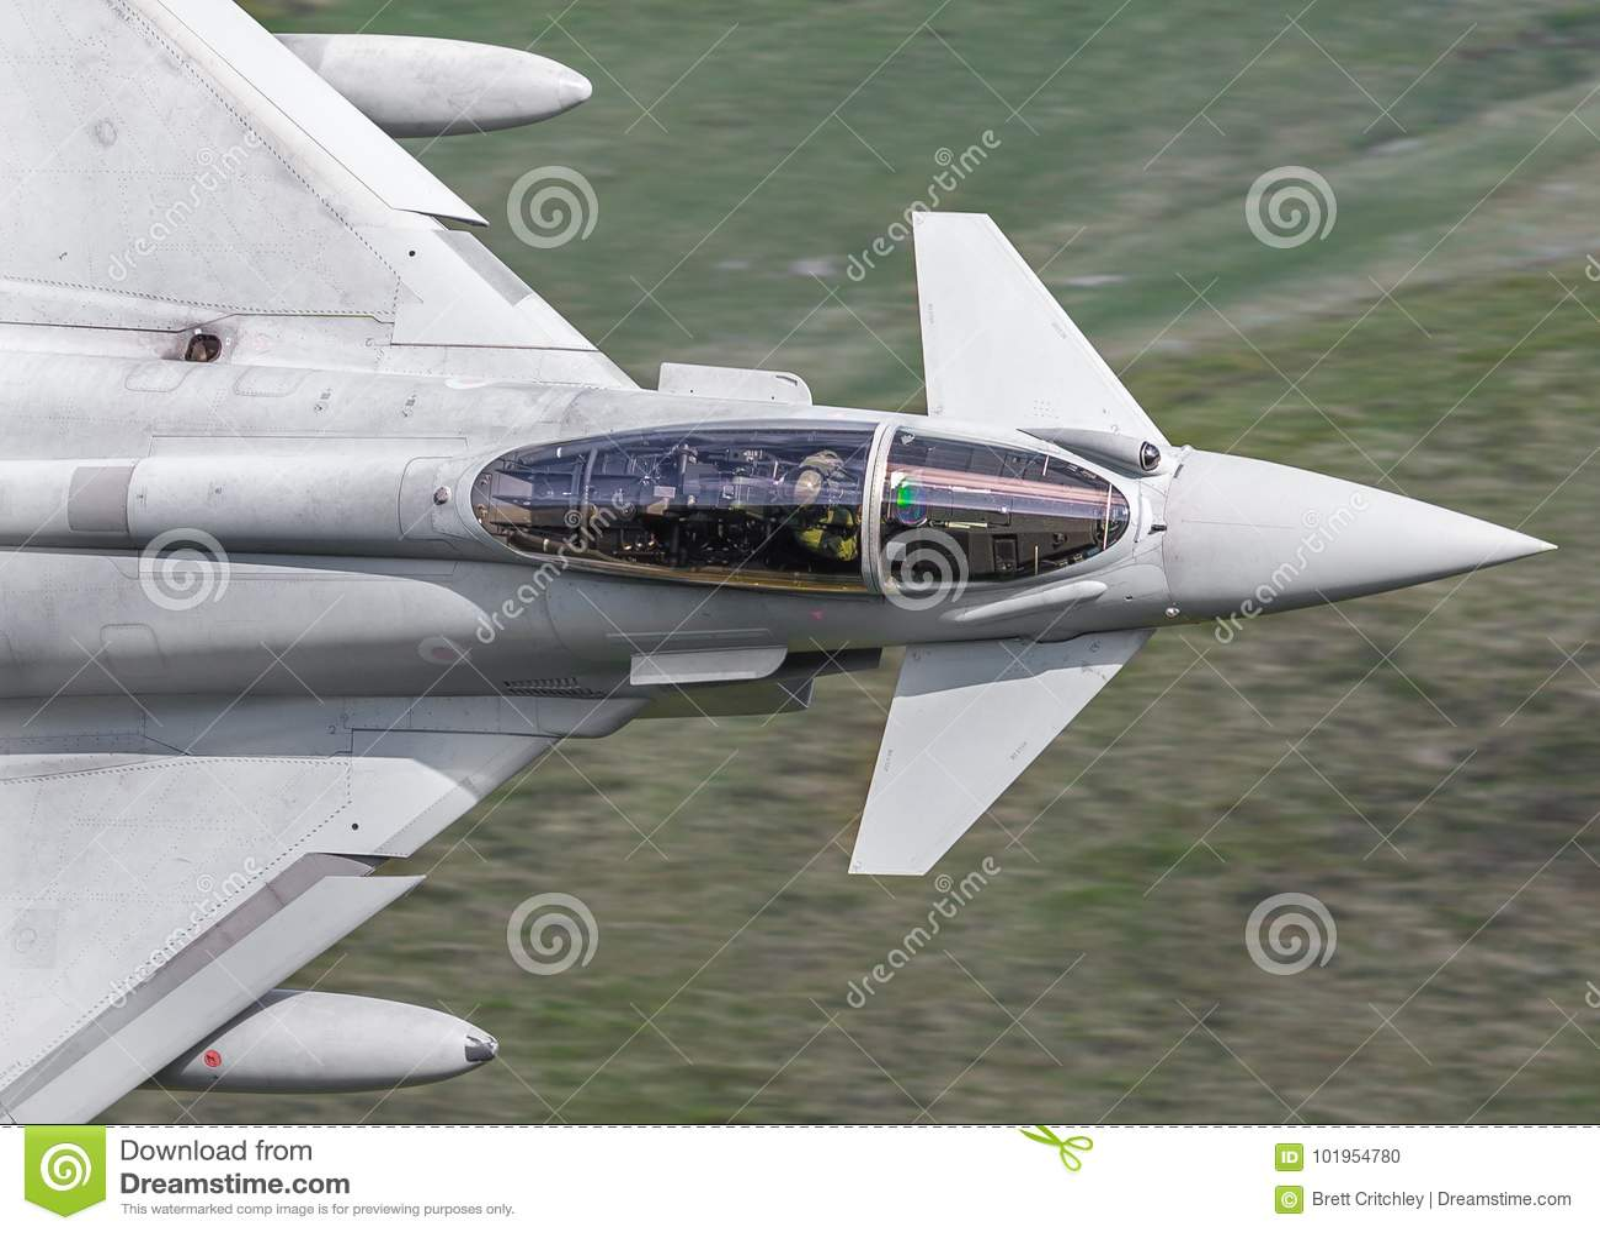 Eurofighter Typhoon Jet Cockpit Stock Photo - Image of